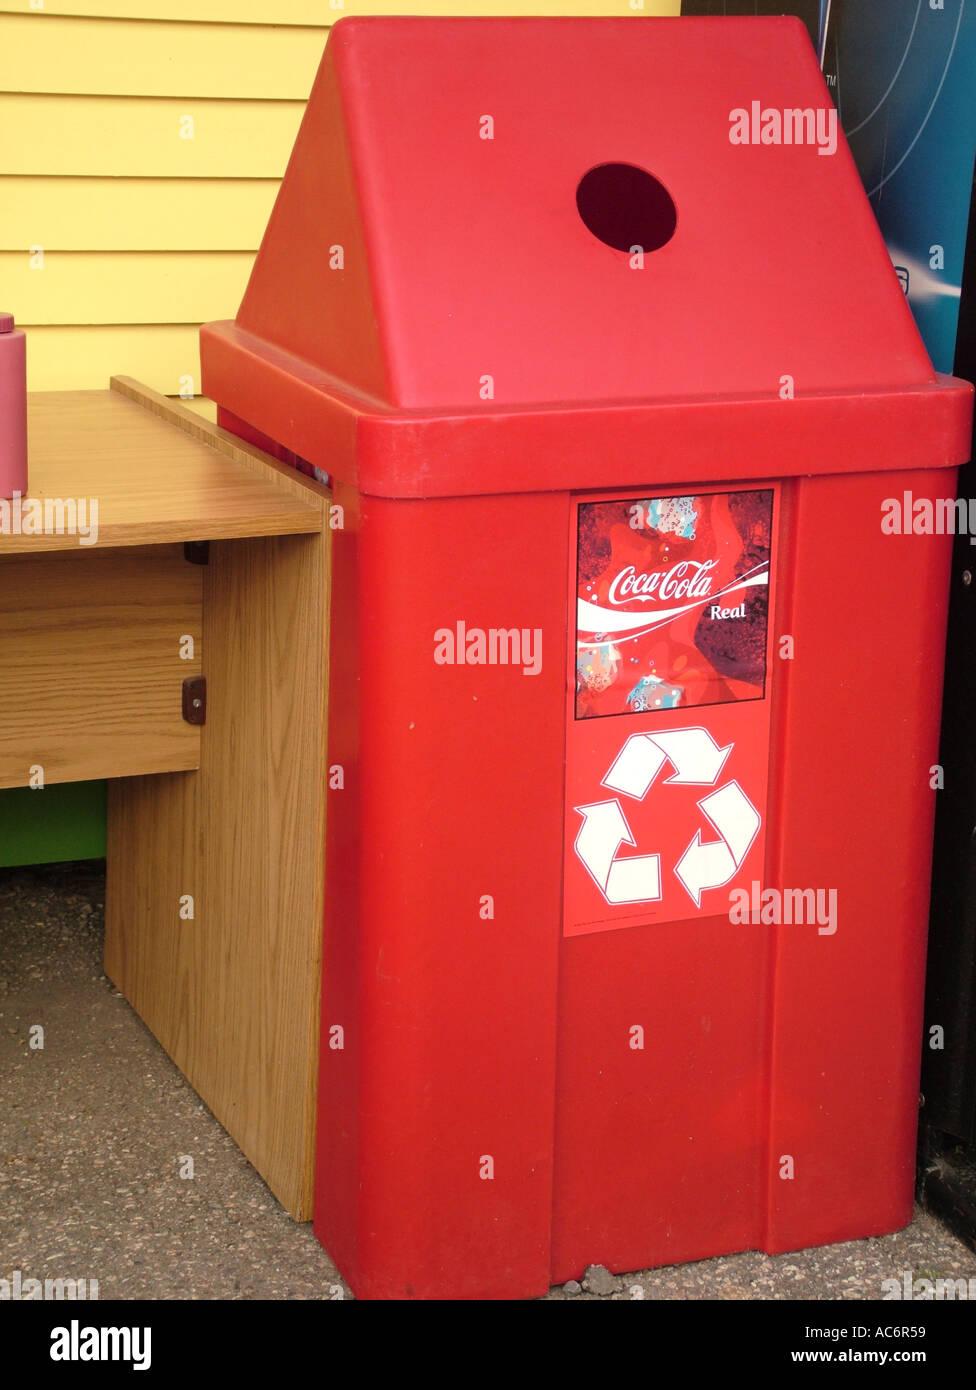 AJD42988, rot Recycling kann, Coca-Cola Sponsor logo Stockbild